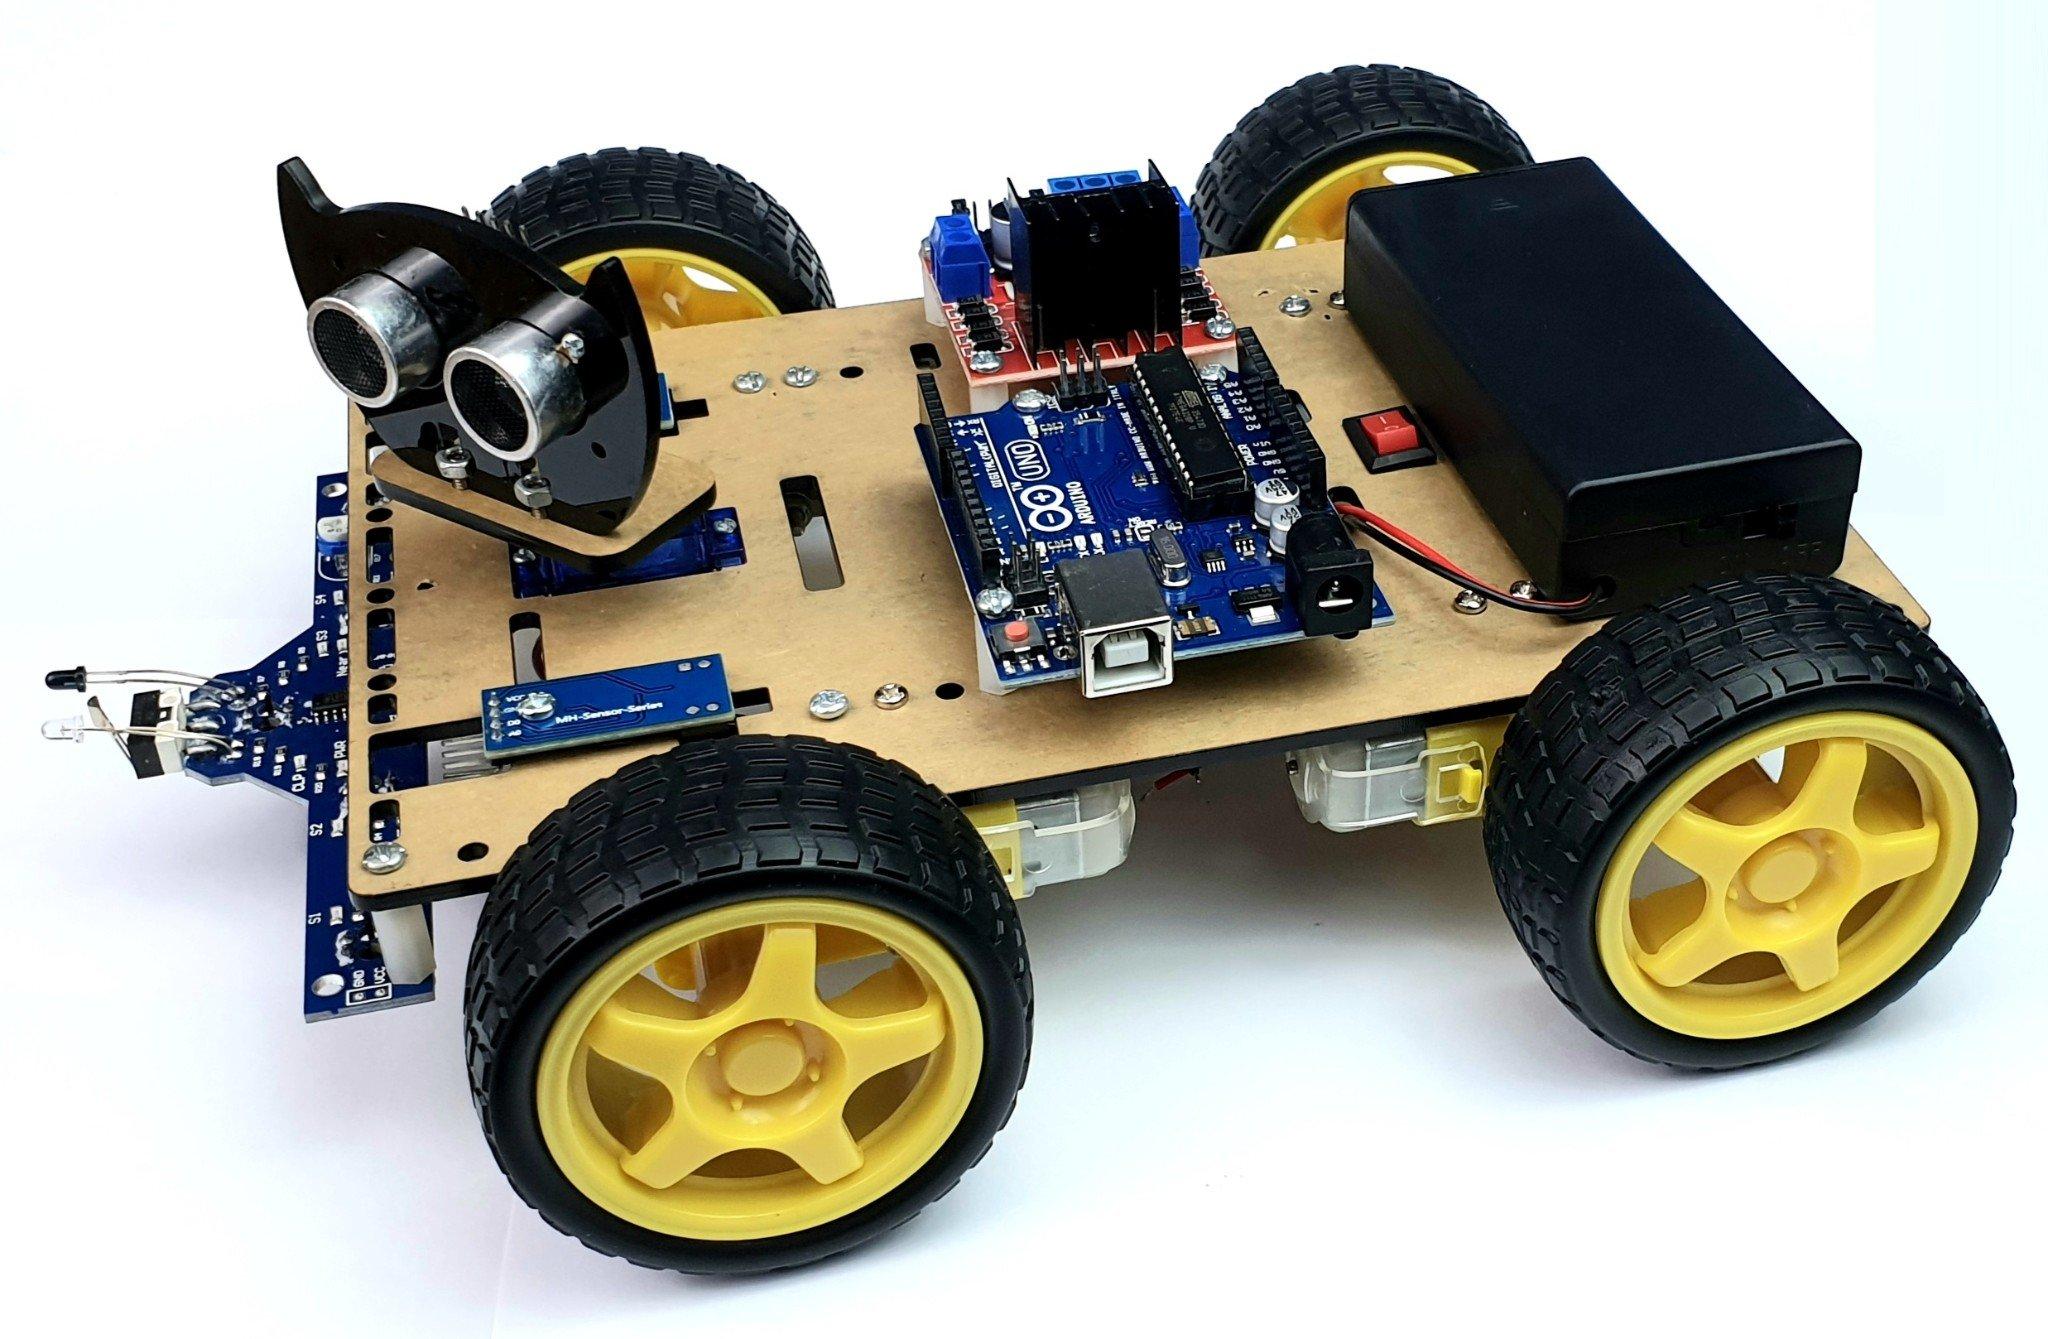 Khung xe Robot Chasiss Black Cat